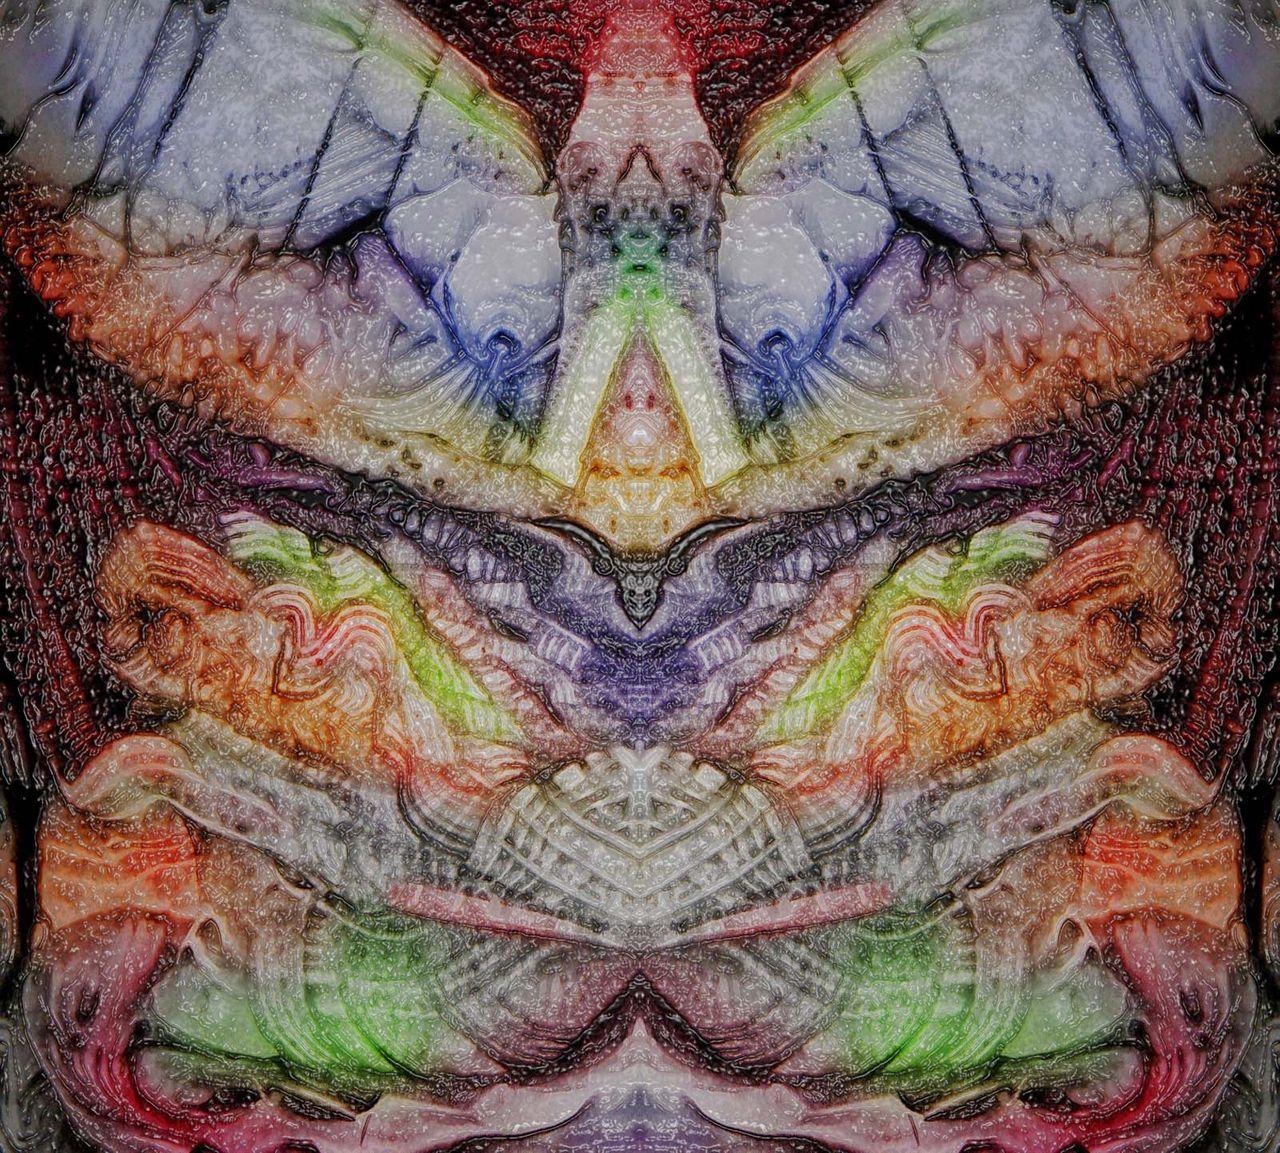 DSCN6968colormirrorplastic  web1600.jpg